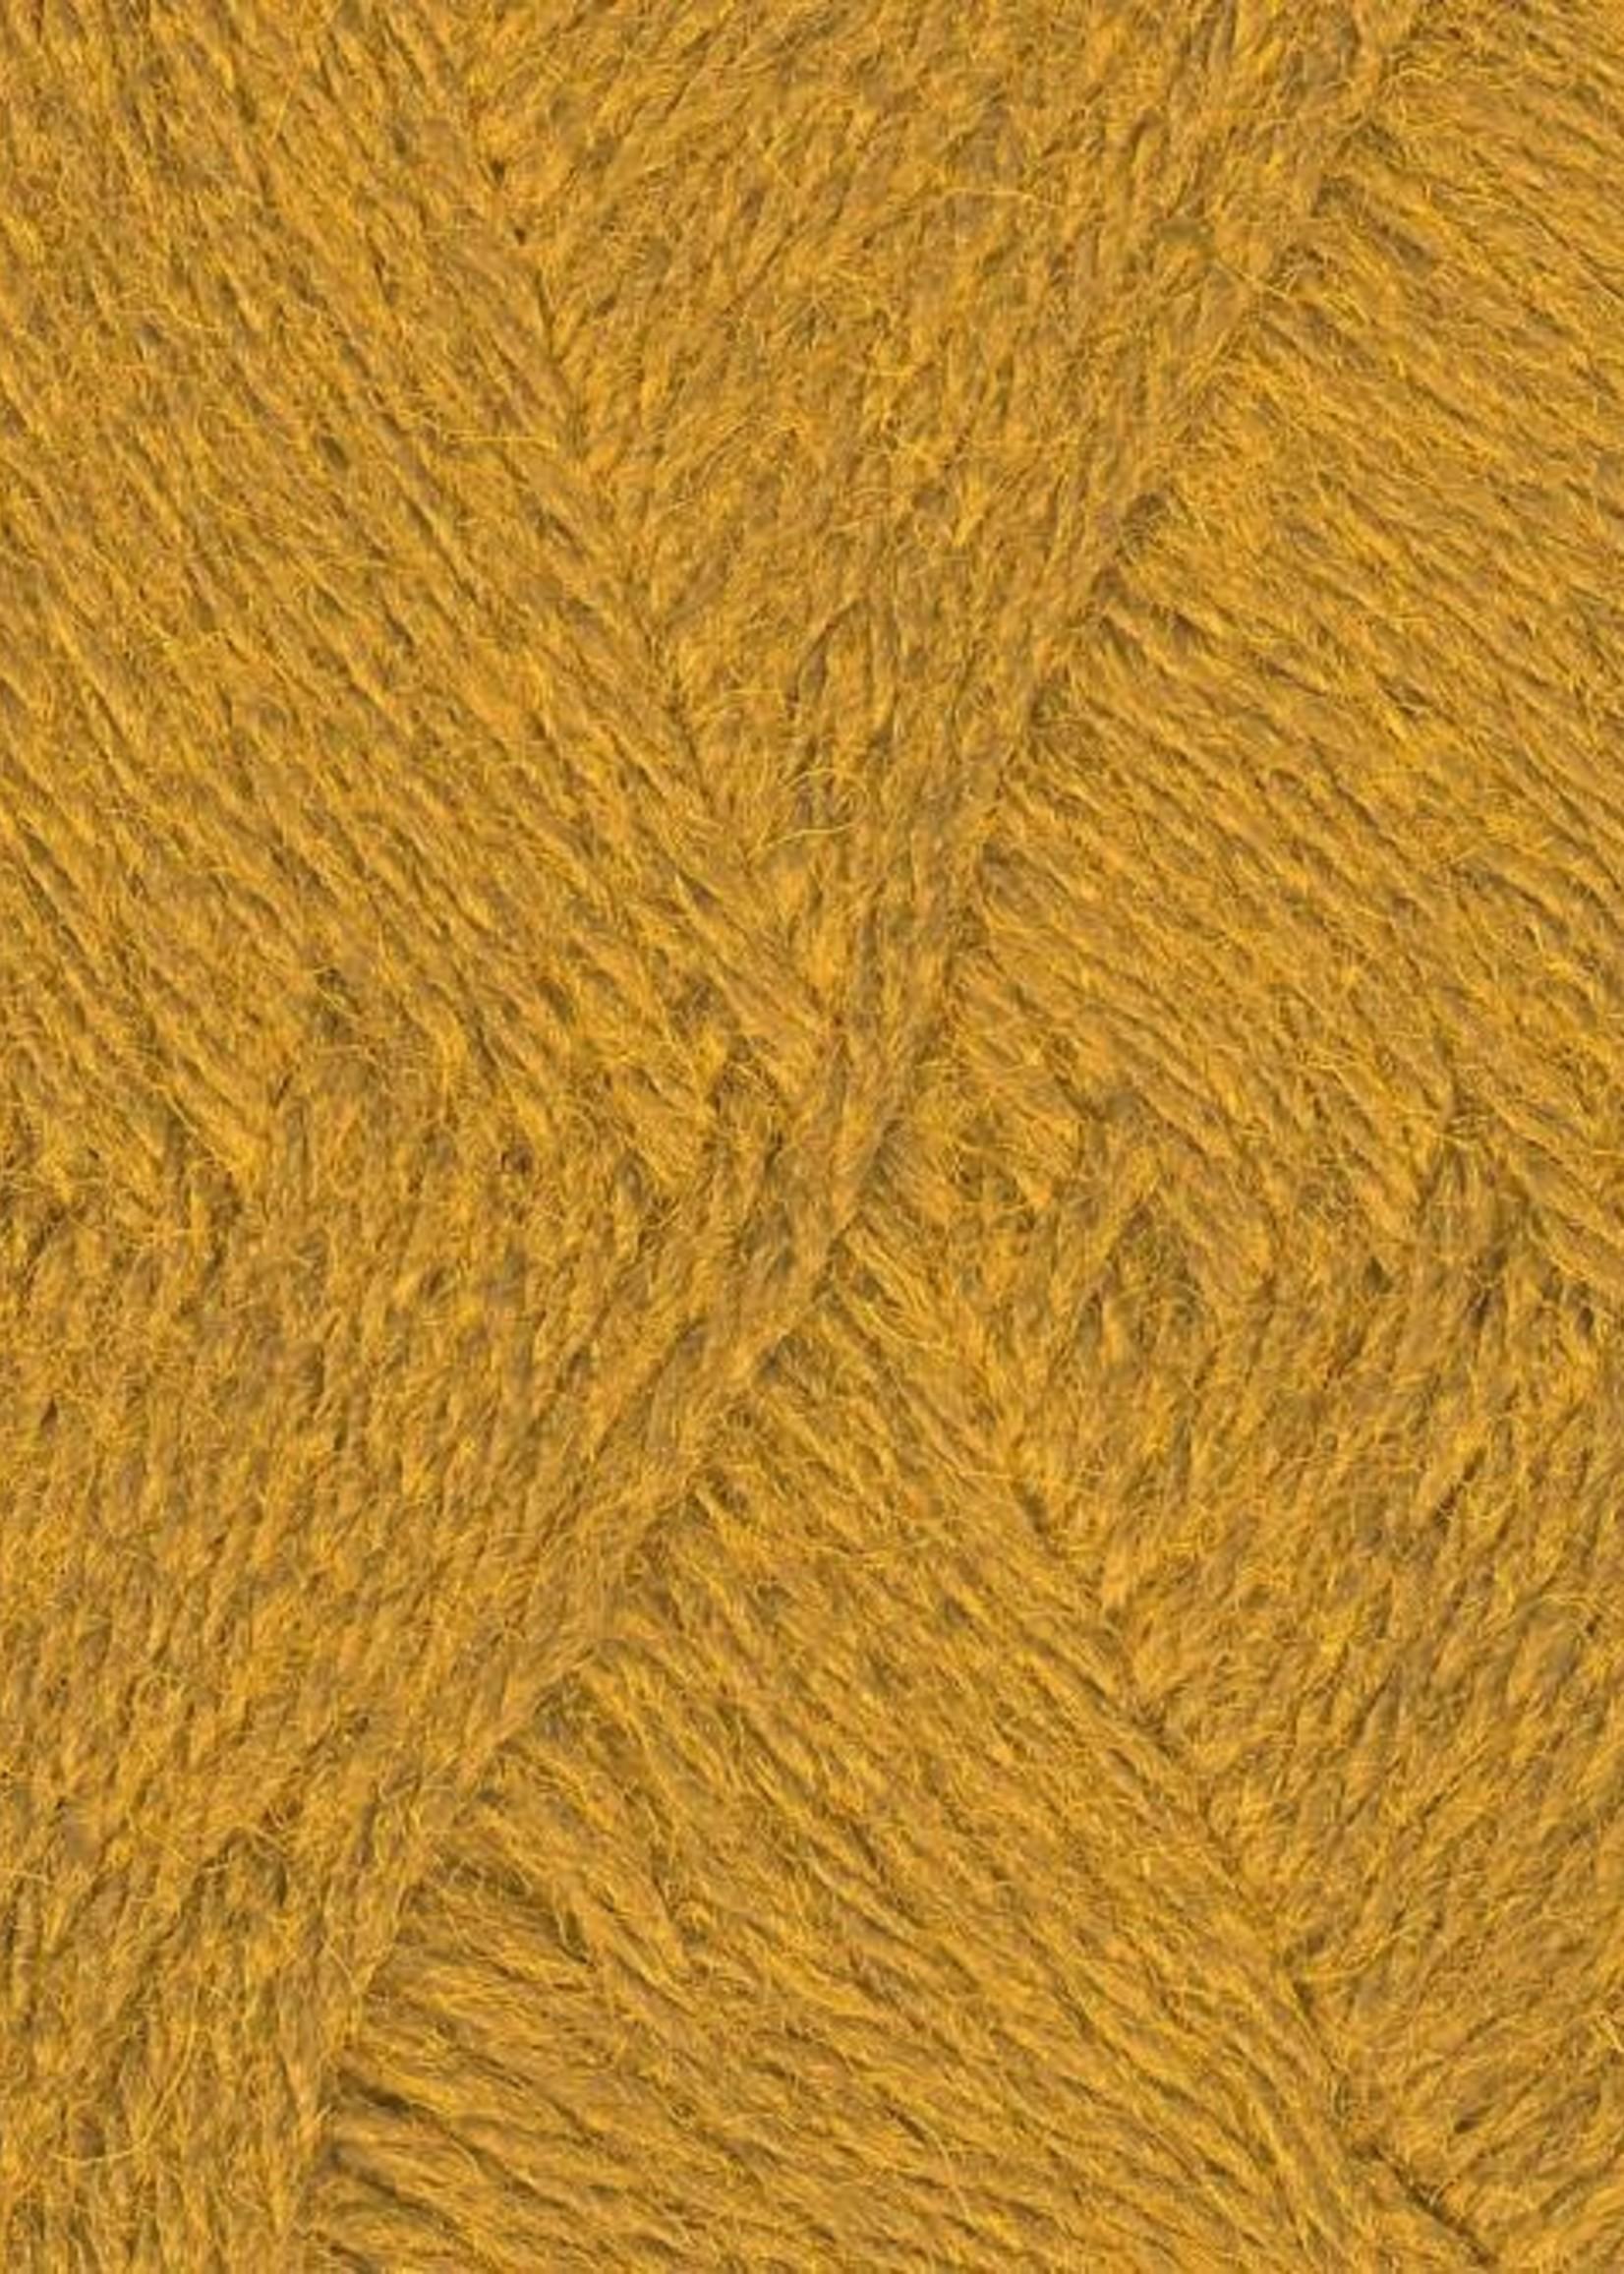 Knitting Fever KFI Collection Teenie Weenie Wool - Gold